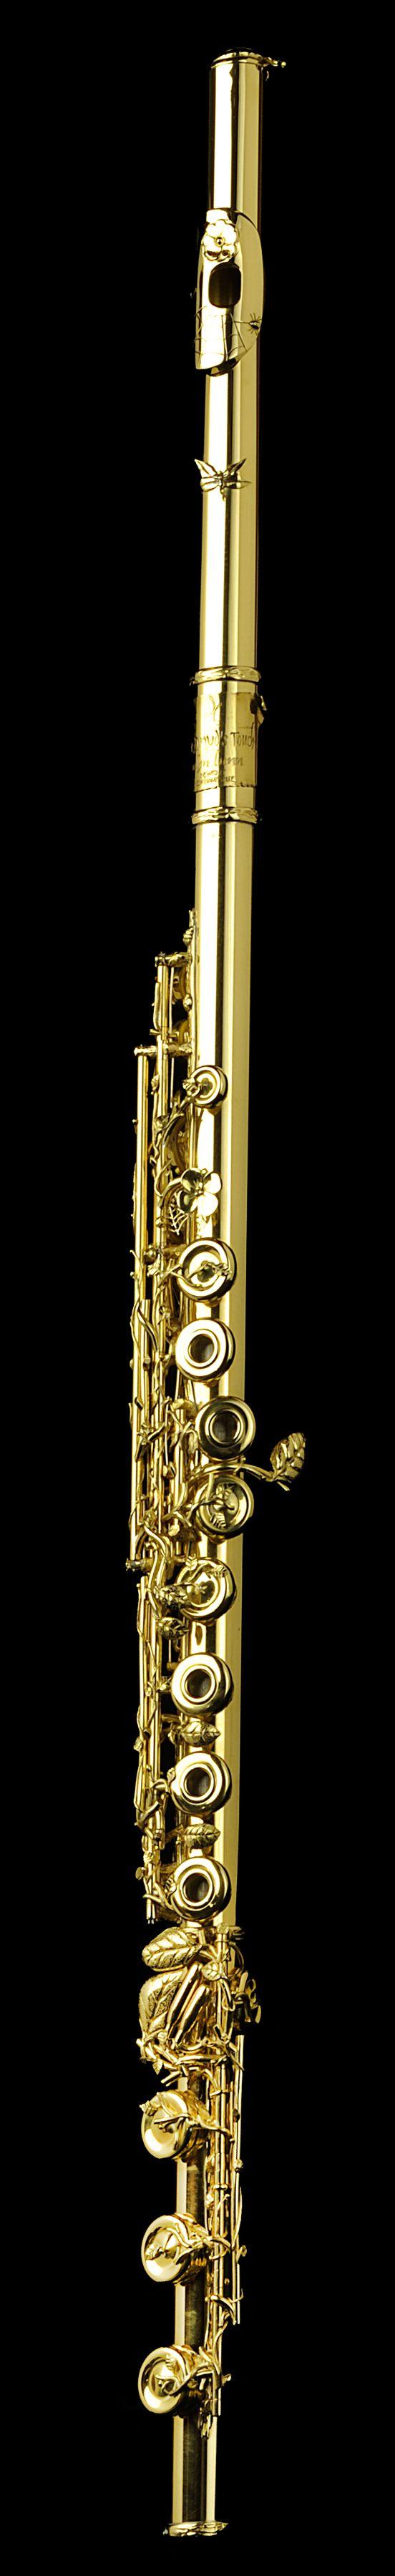 """The Dryad's Touch"" 18k green gold art nouveau flute."